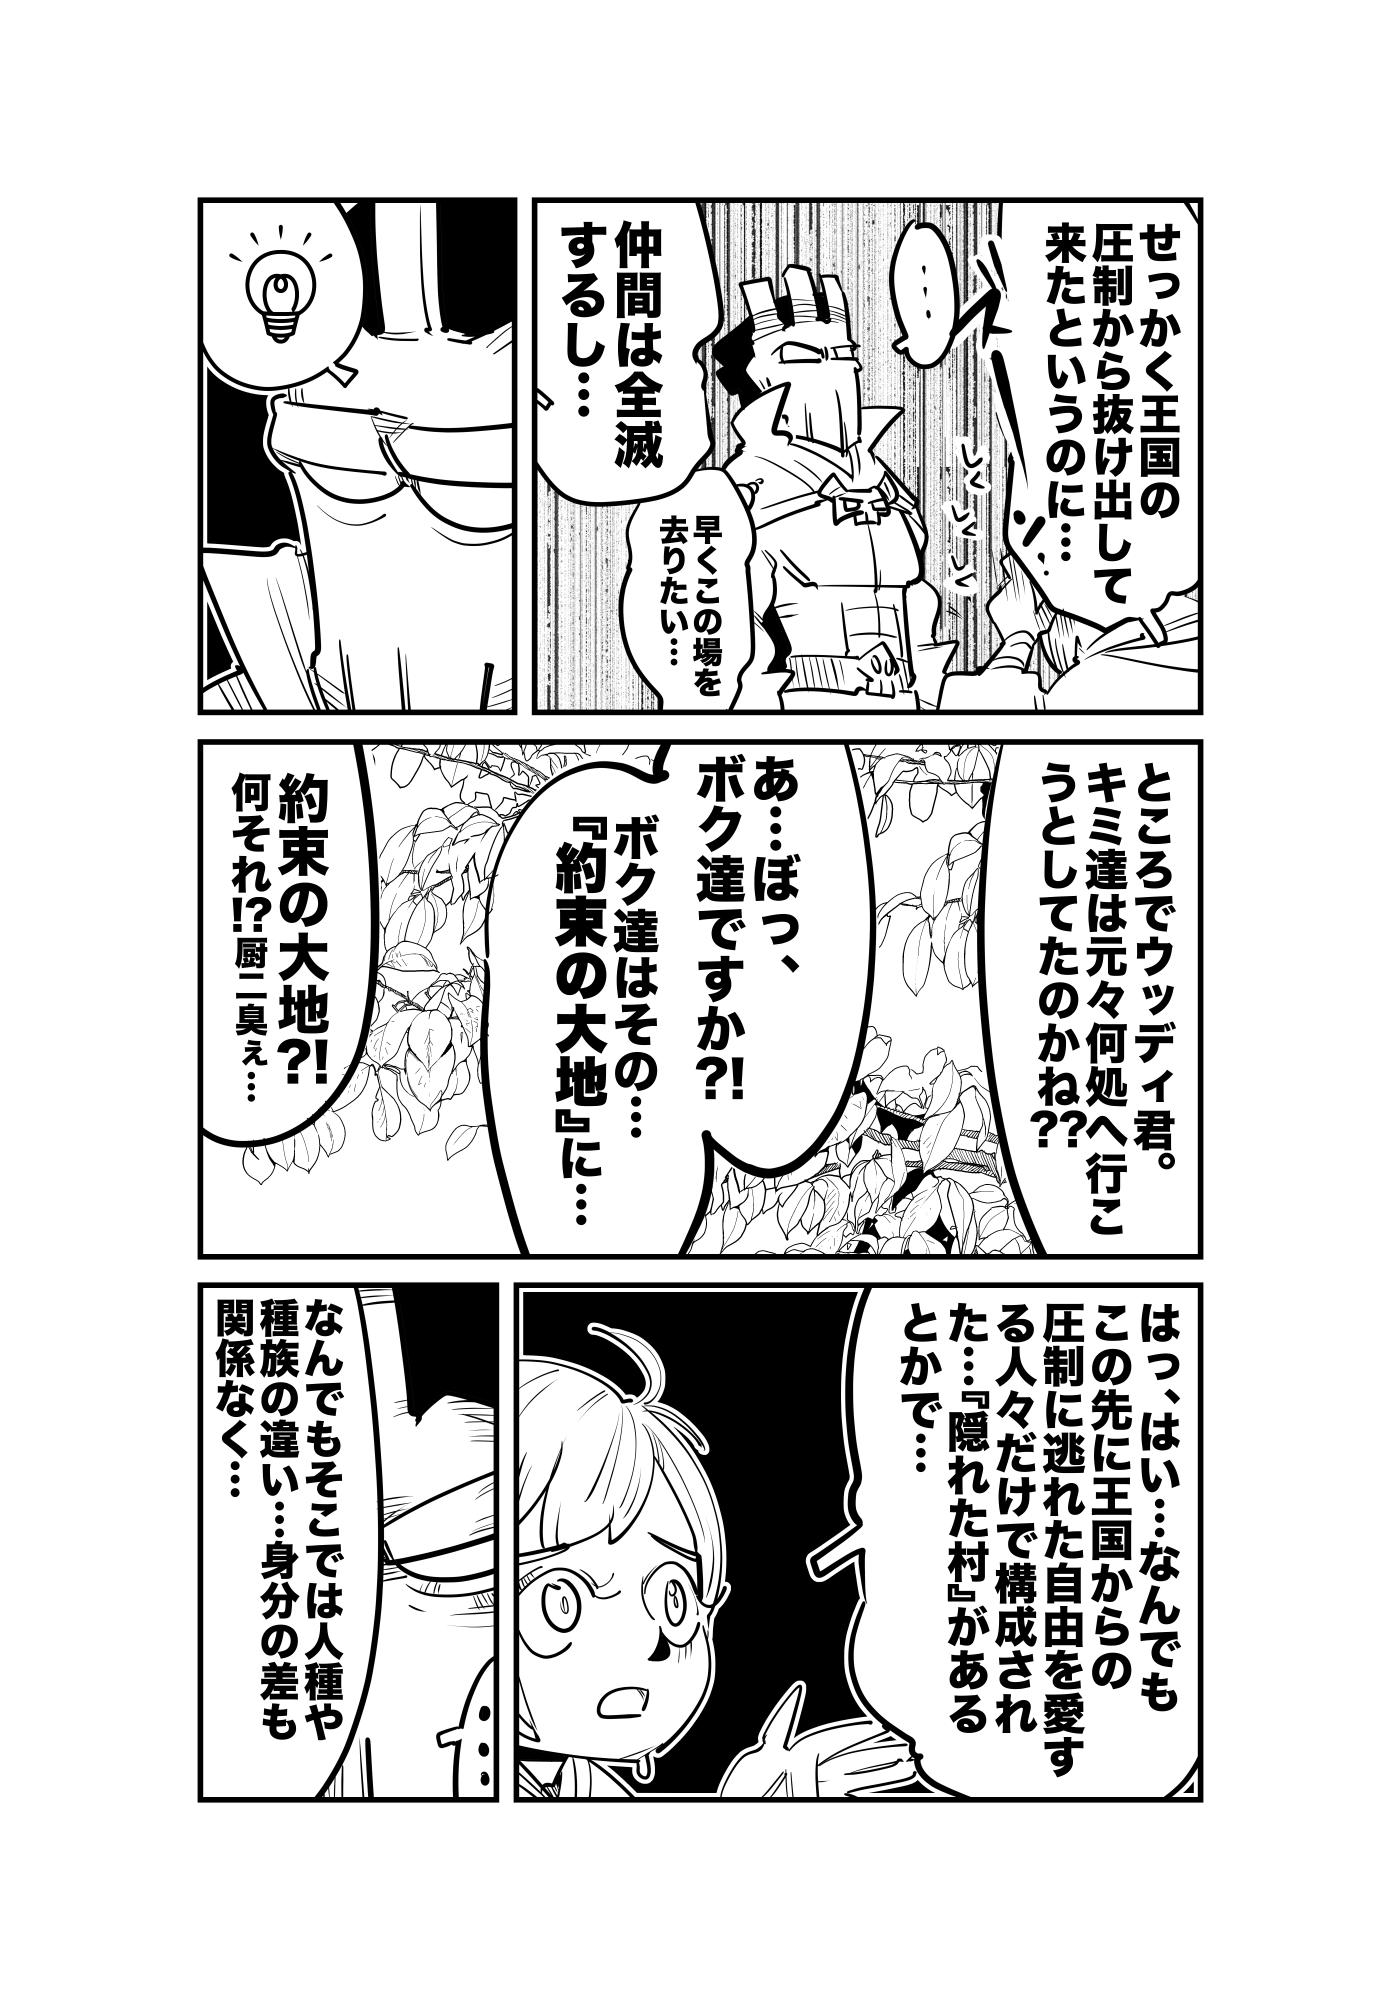 f:id:terashimaru117:20210914225729p:plain